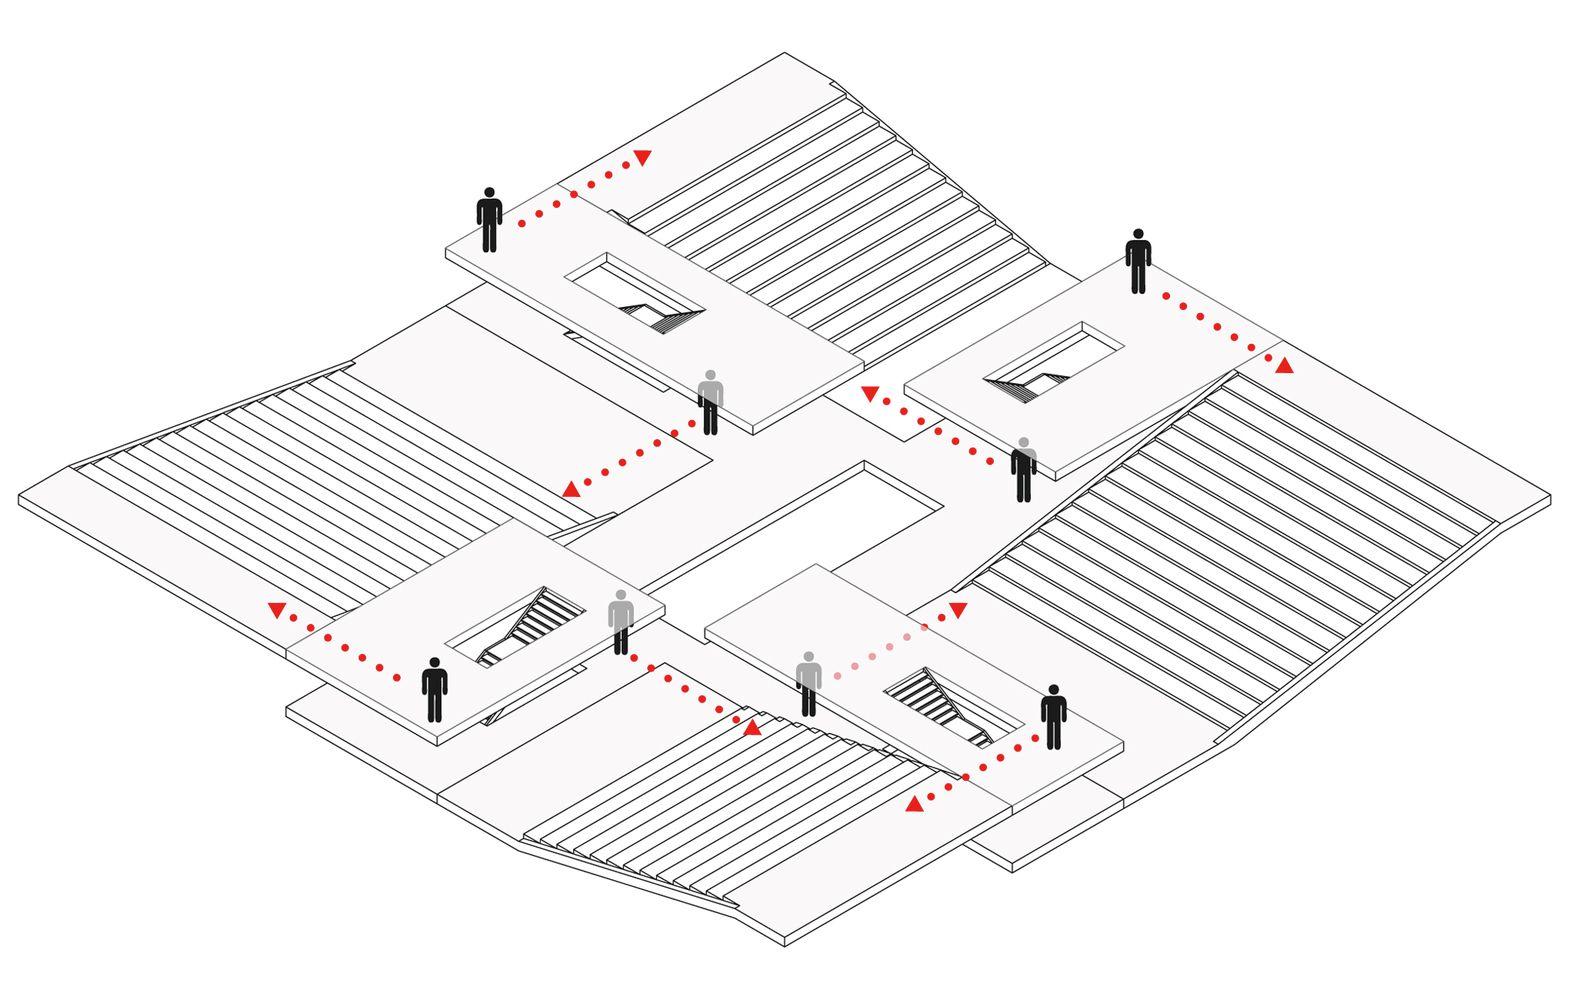 Gallery Of Building O University Of Antwerp Auditorium And Research Building Winning Proposal Meta Architectuurbureau 6 University Architecture Architecture Drawing Diagram Architecture